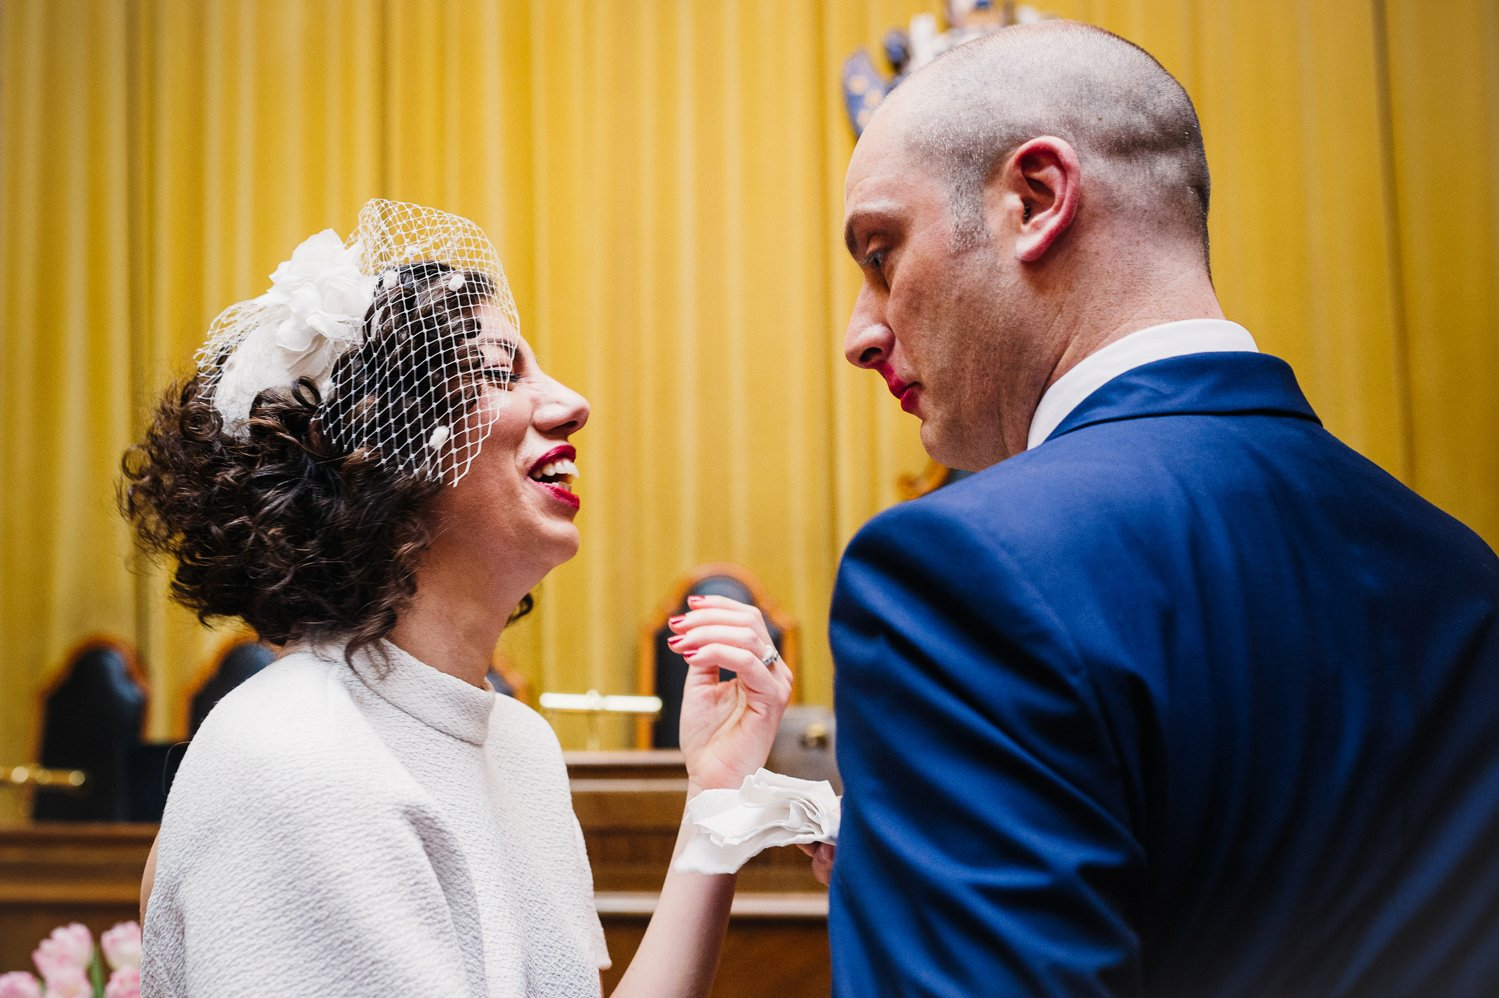 brixton east wedding photographer-9